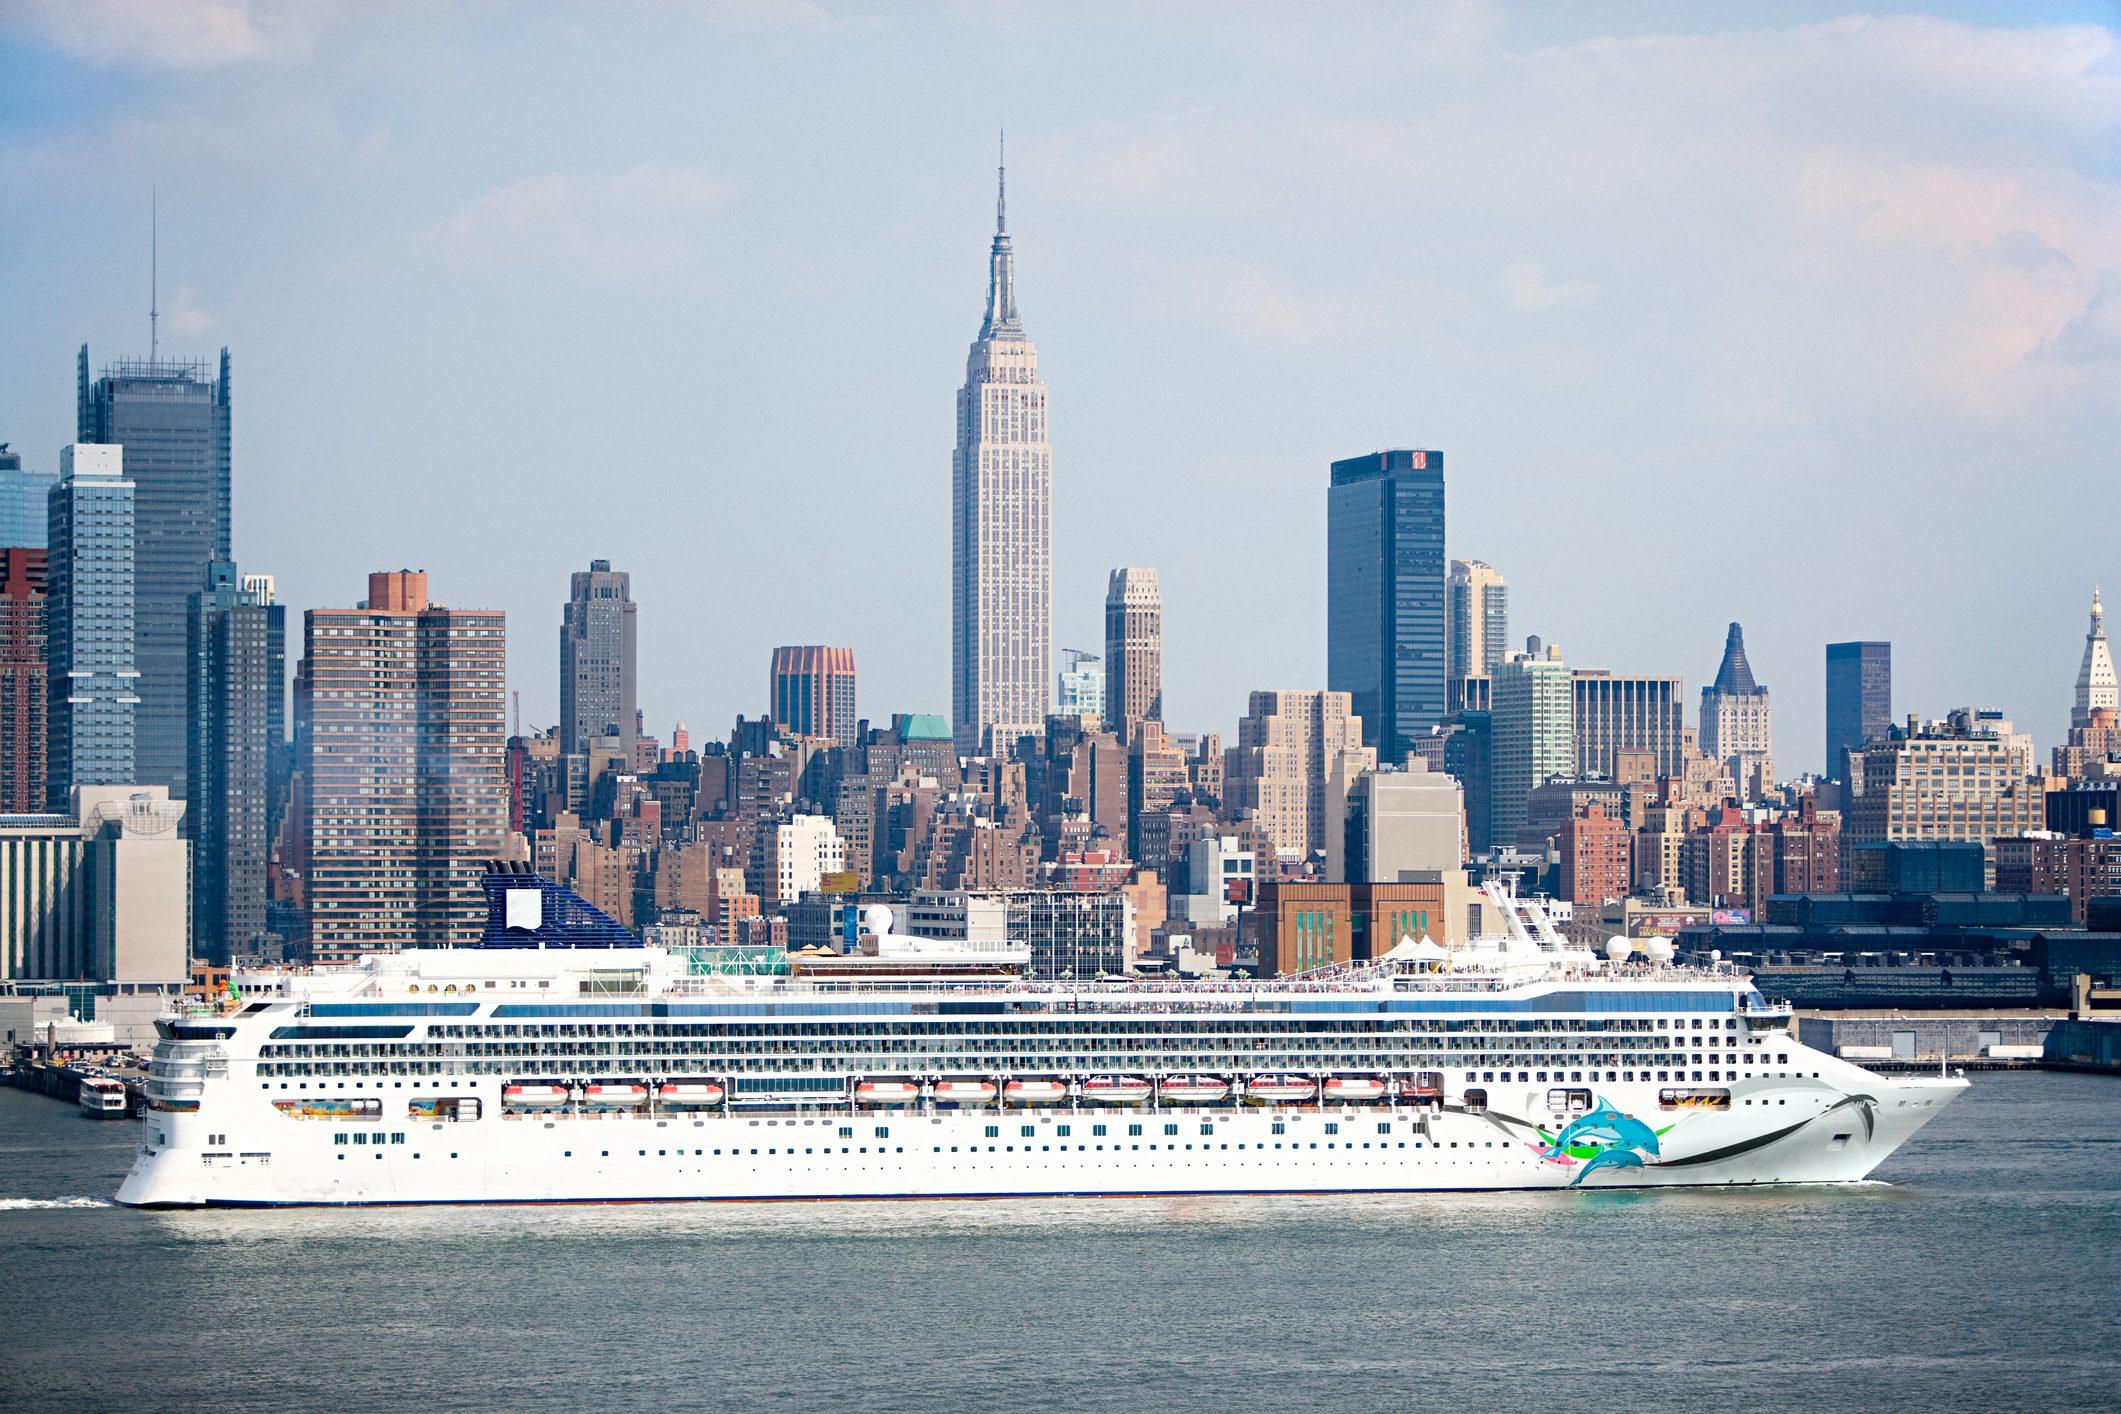 Cruise ship on hudson river new york